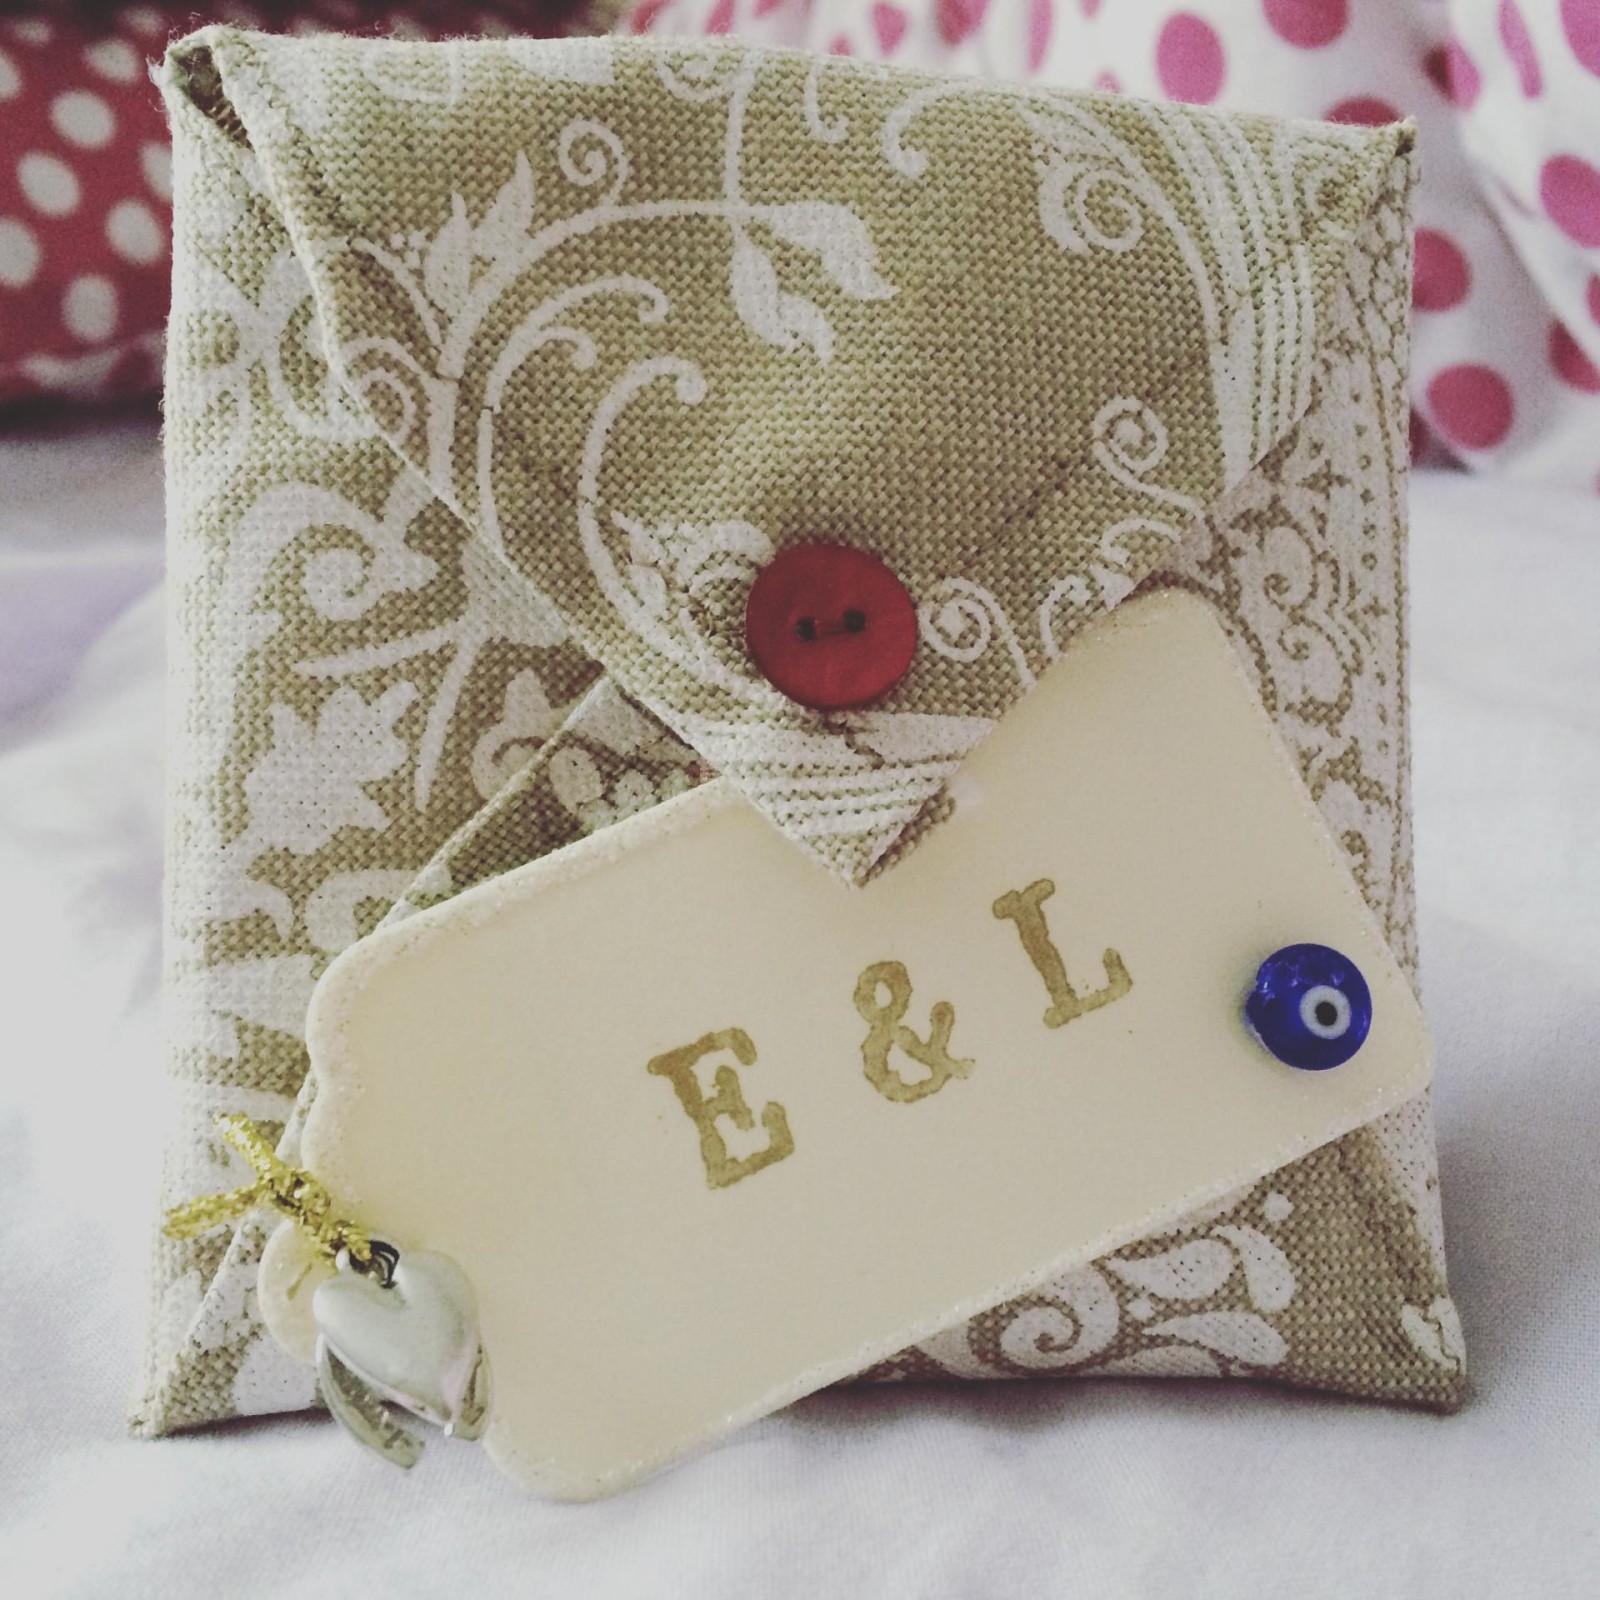 DIY Handmade Wedding Favours